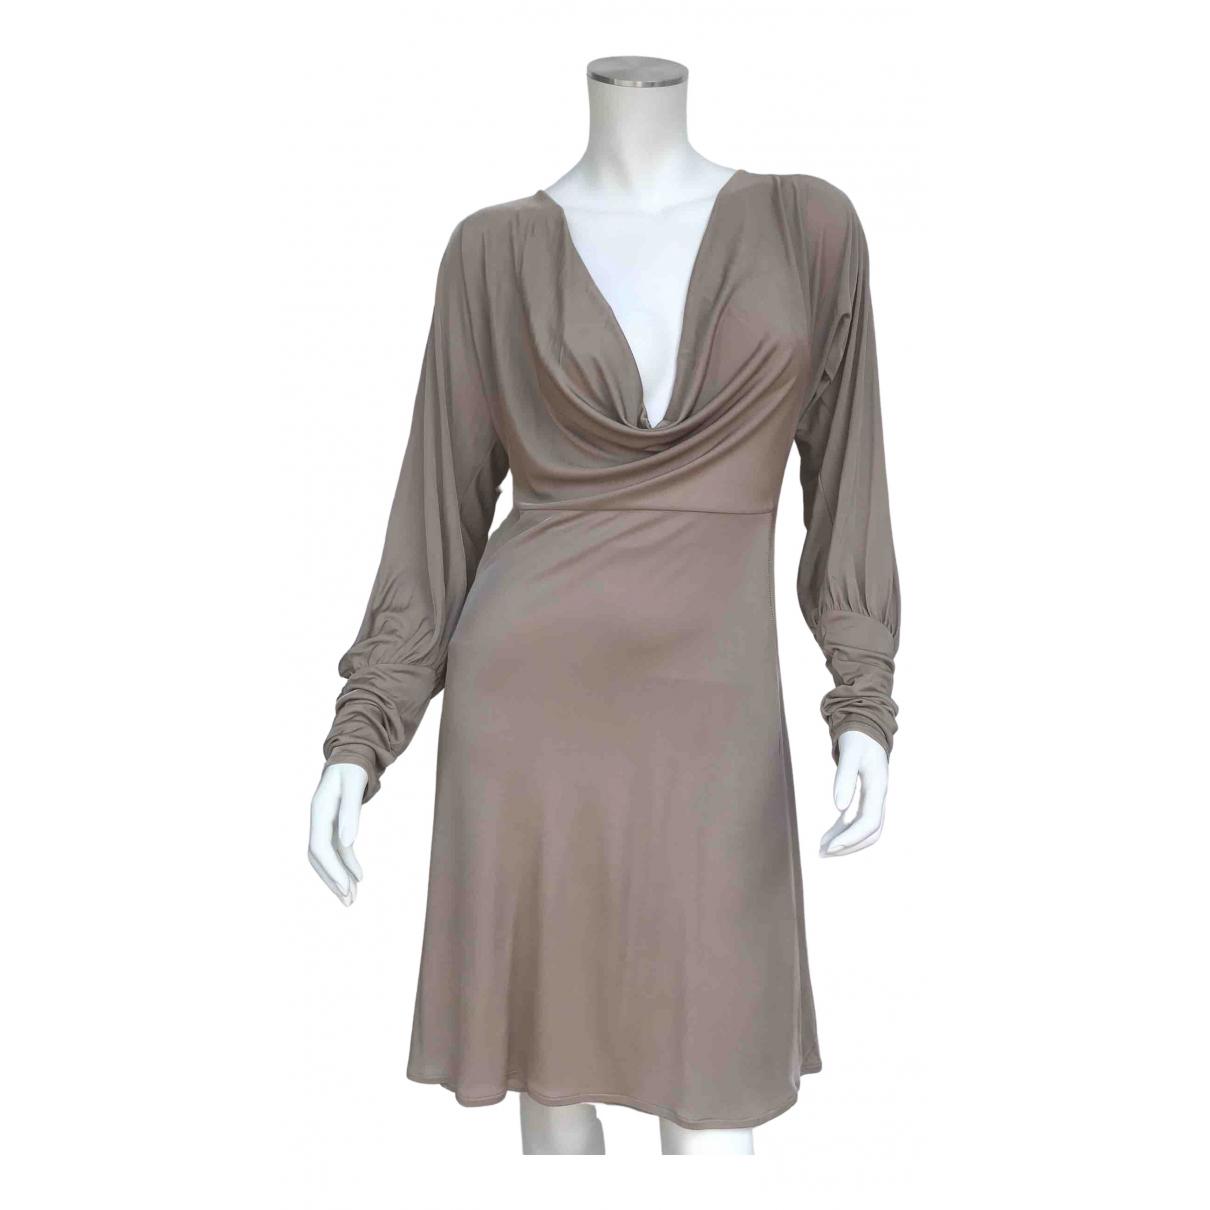 M Missoni N Camel dress for Women 38 IT